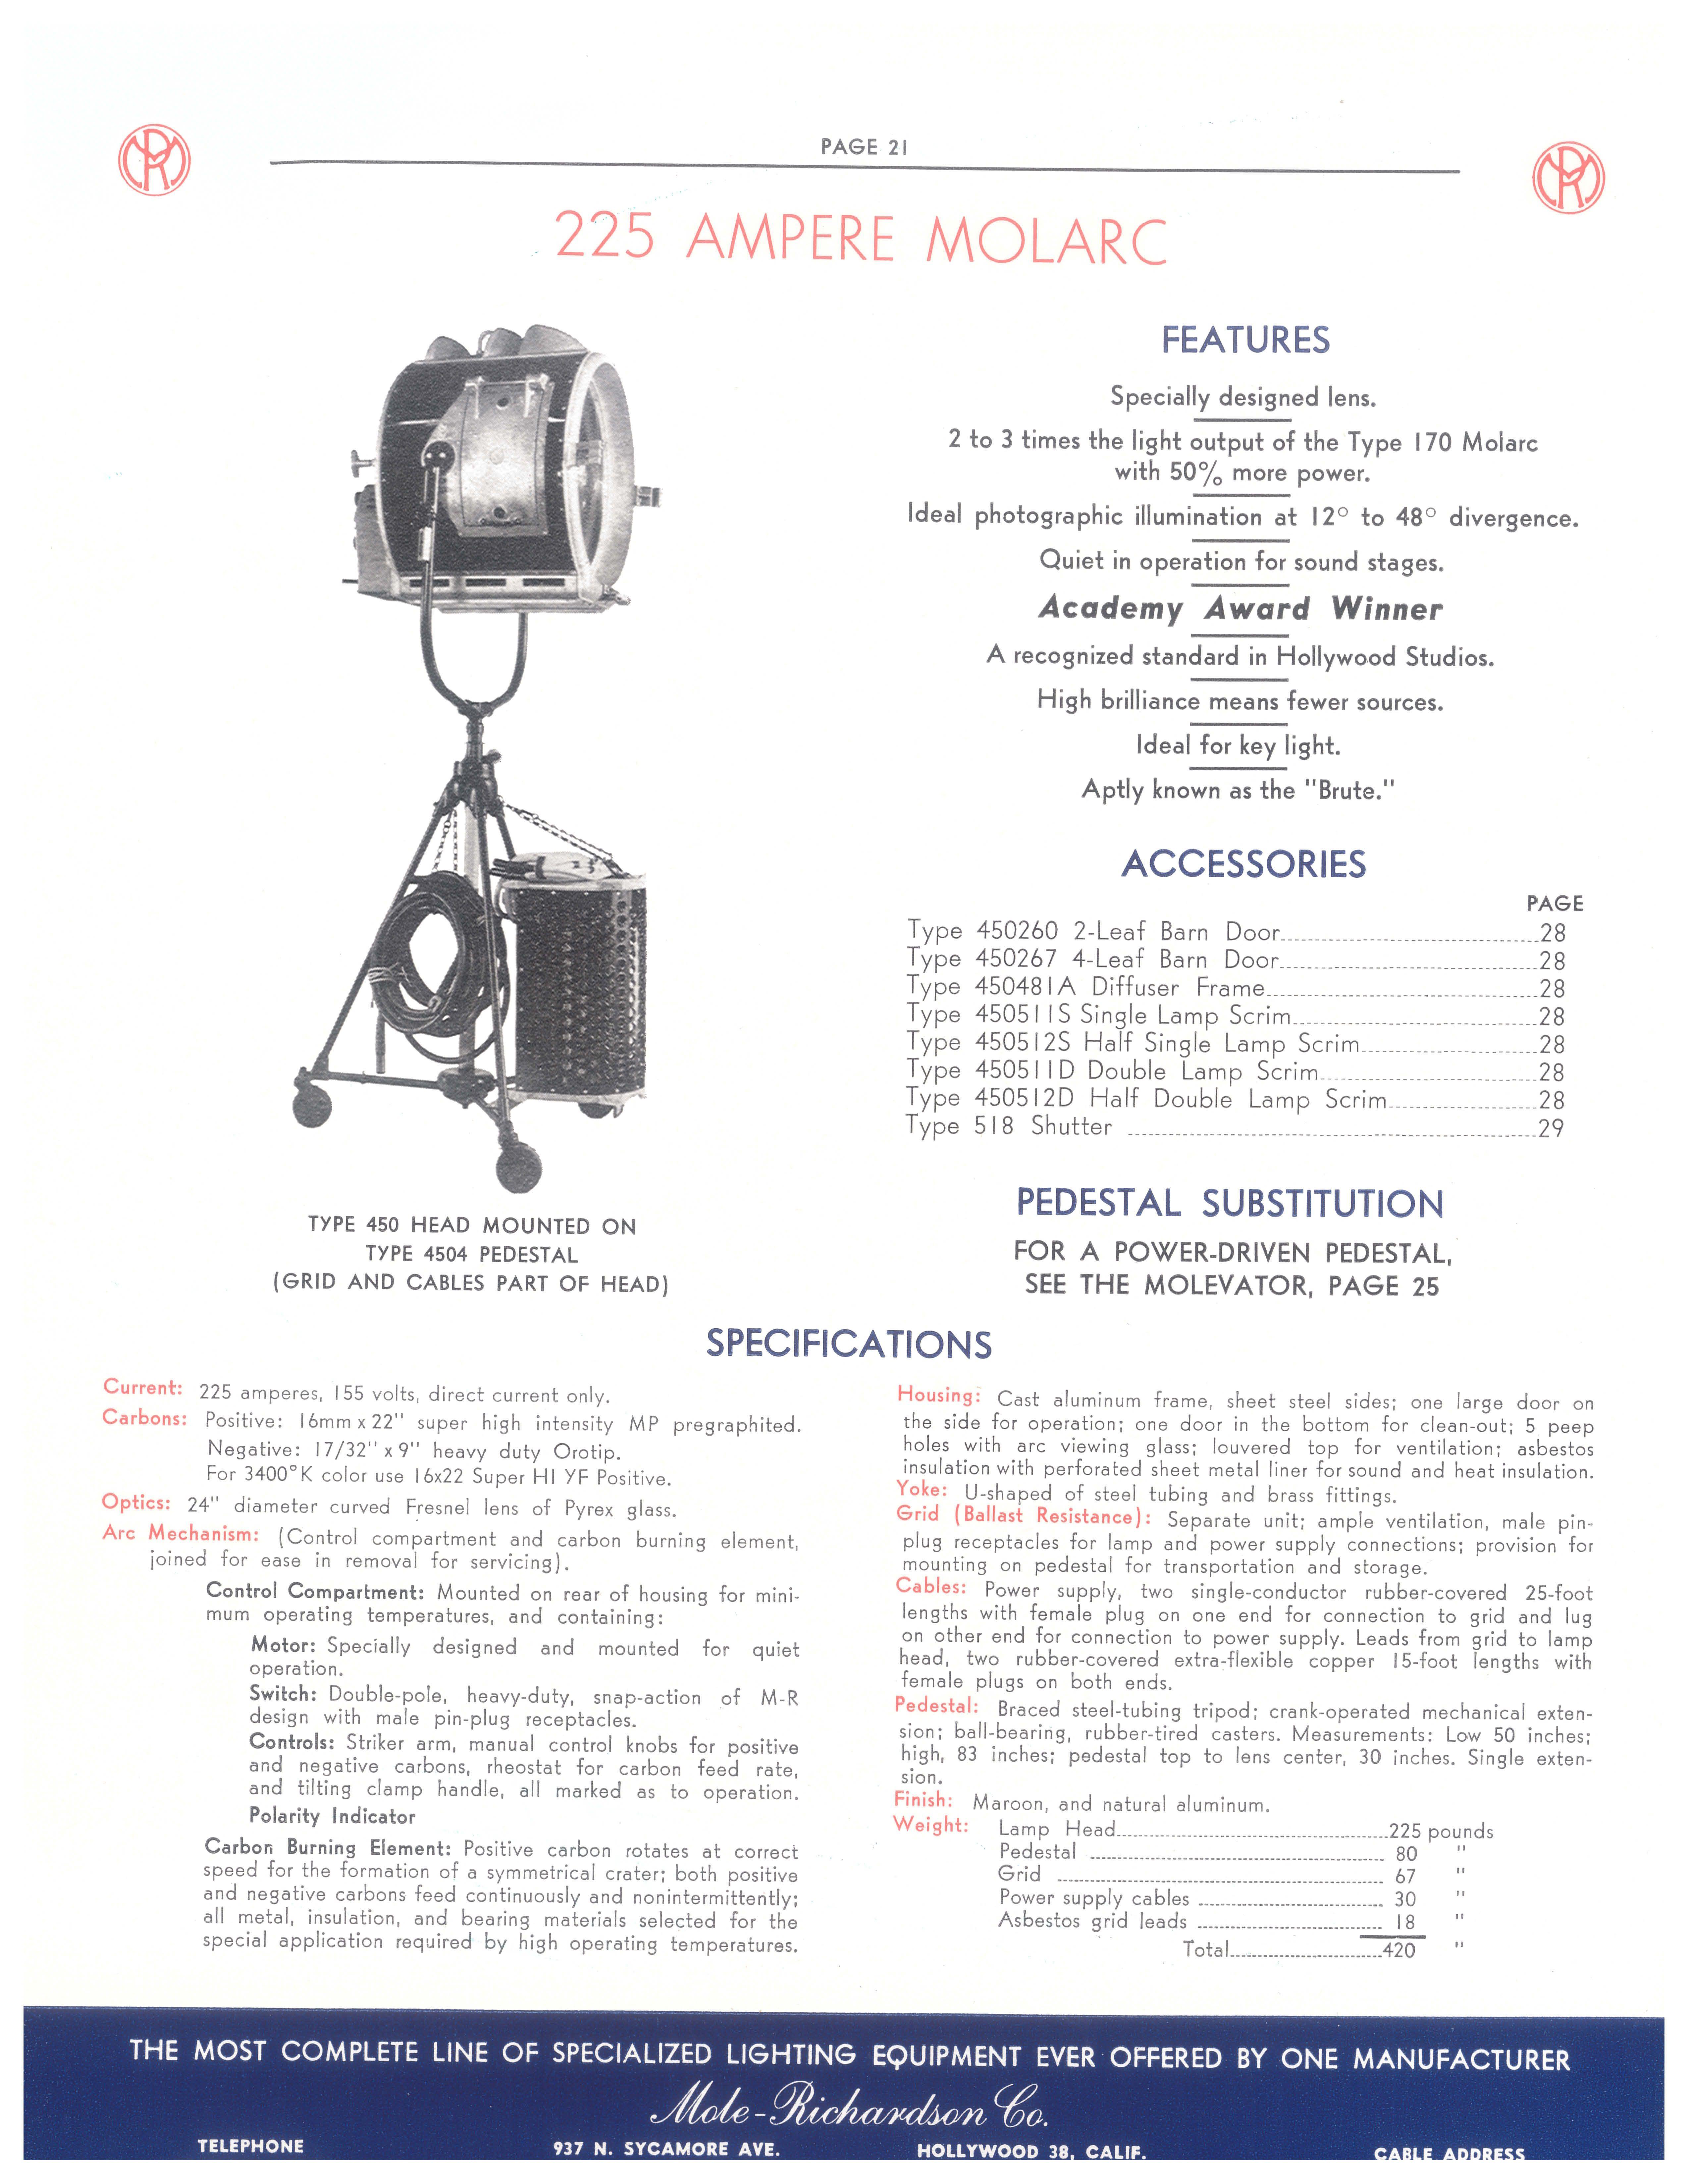 Type Mr 450 225 Ampere Molarc Http Www Mole Com Mole Light